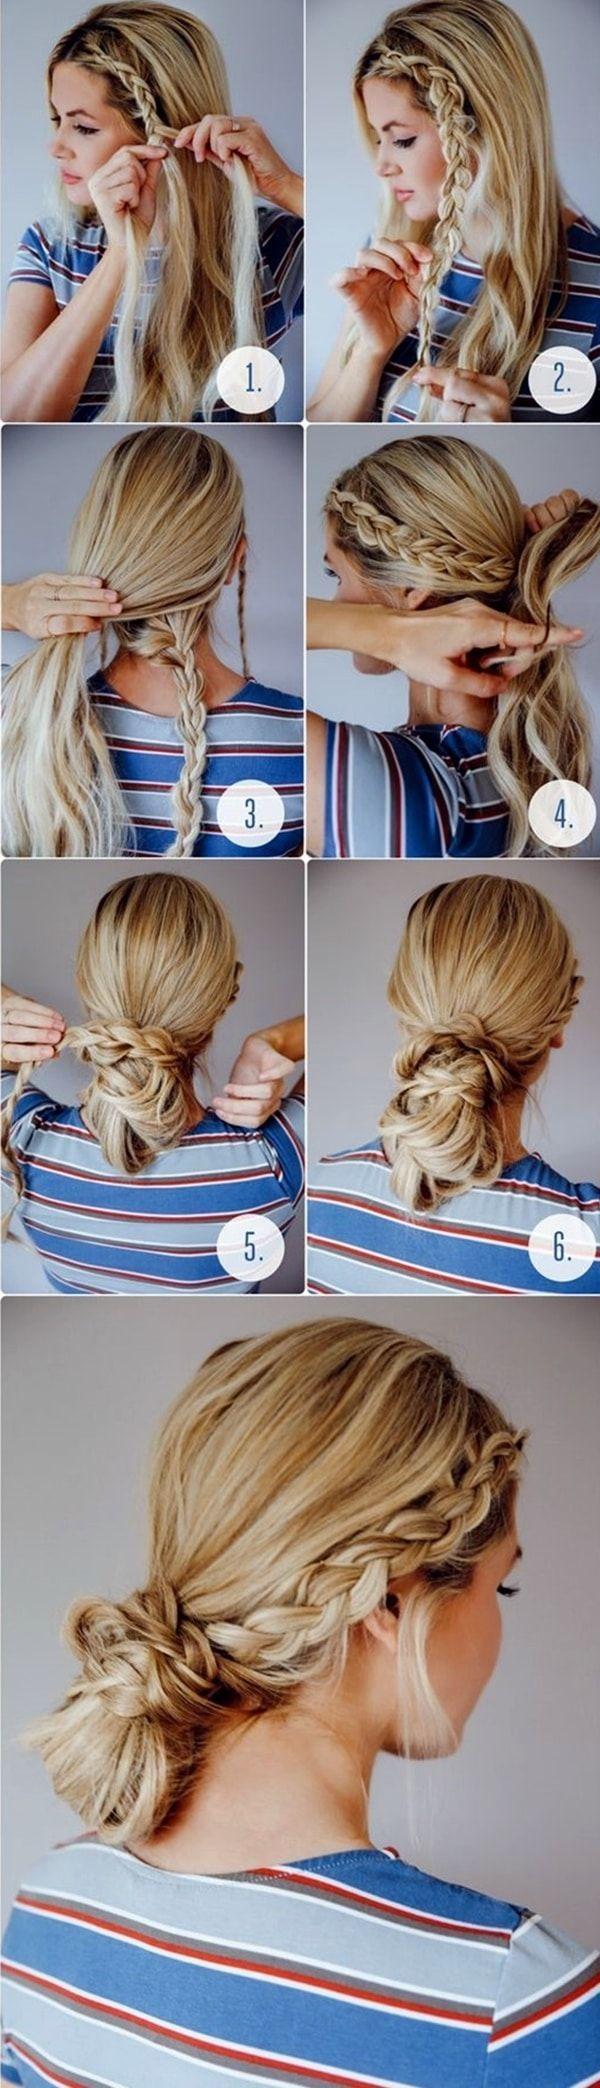 Quick Cute Hairstyles Quickhairstyletutorialsforofficewomen10  Hairstyle